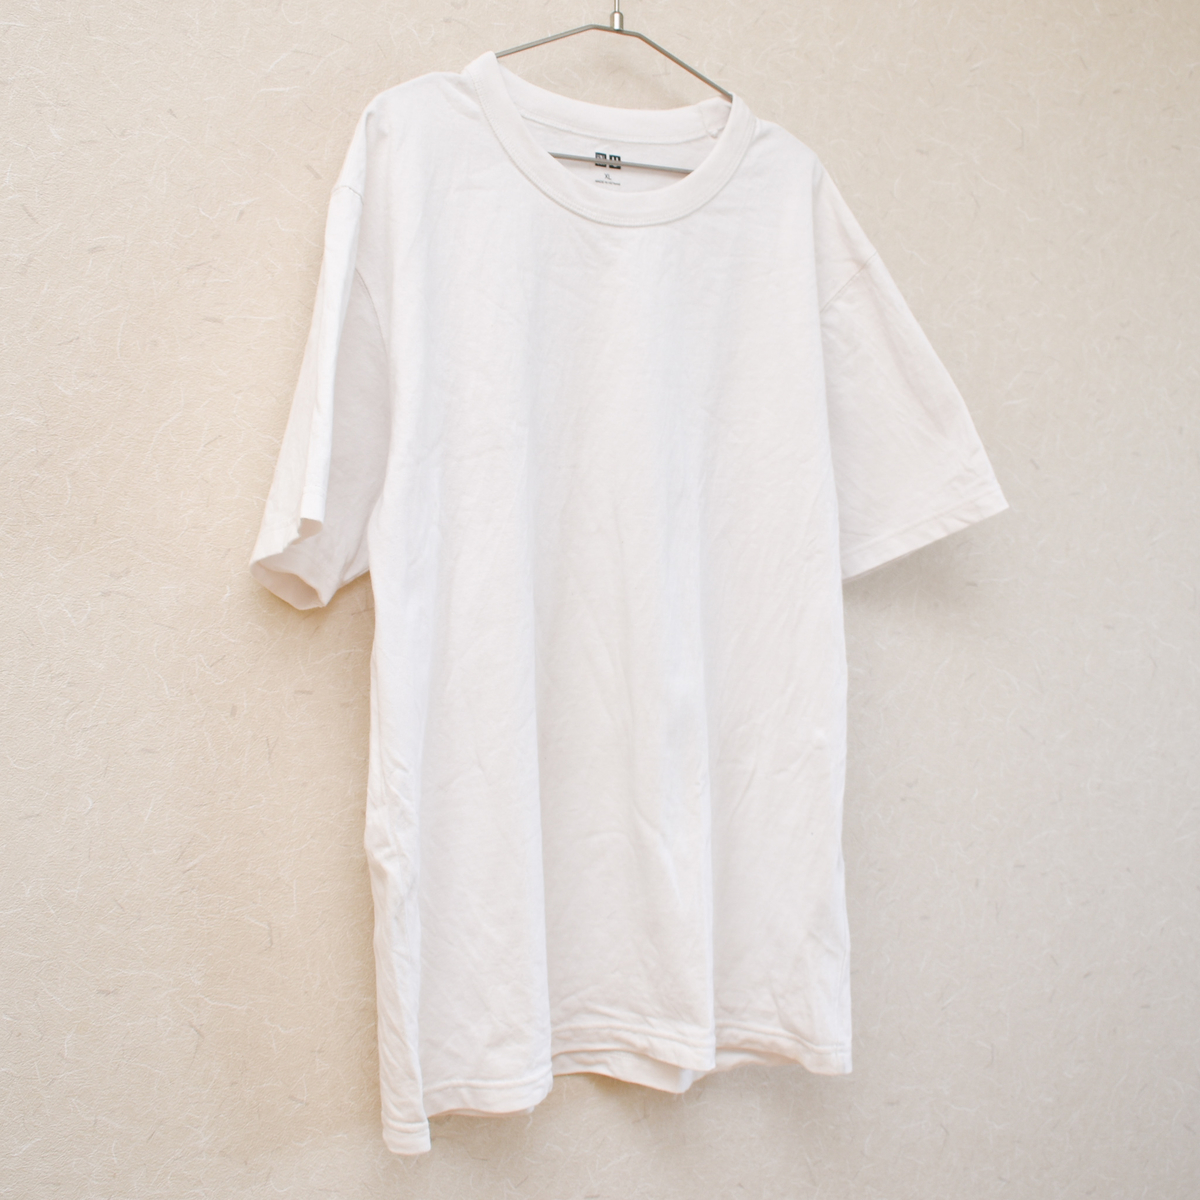 f:id:yamada0221:20190530110110j:plain